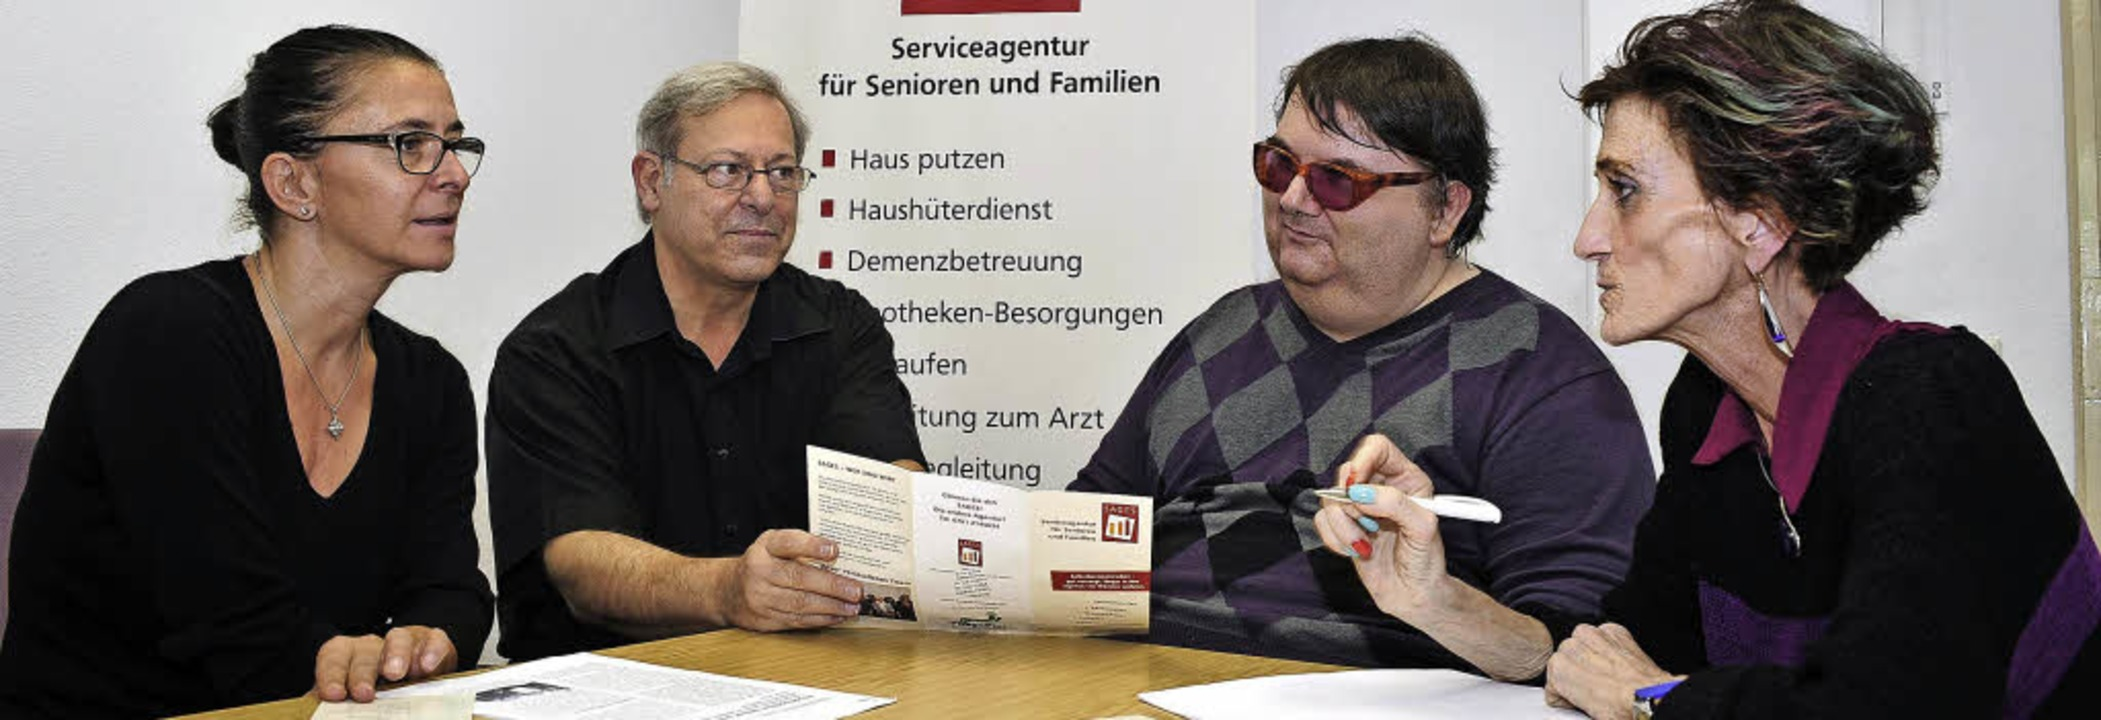 Alles muss organisiert sein: Ramona Wa...Eiche, Birgitta Bombardi (von links).   | Foto: kunz